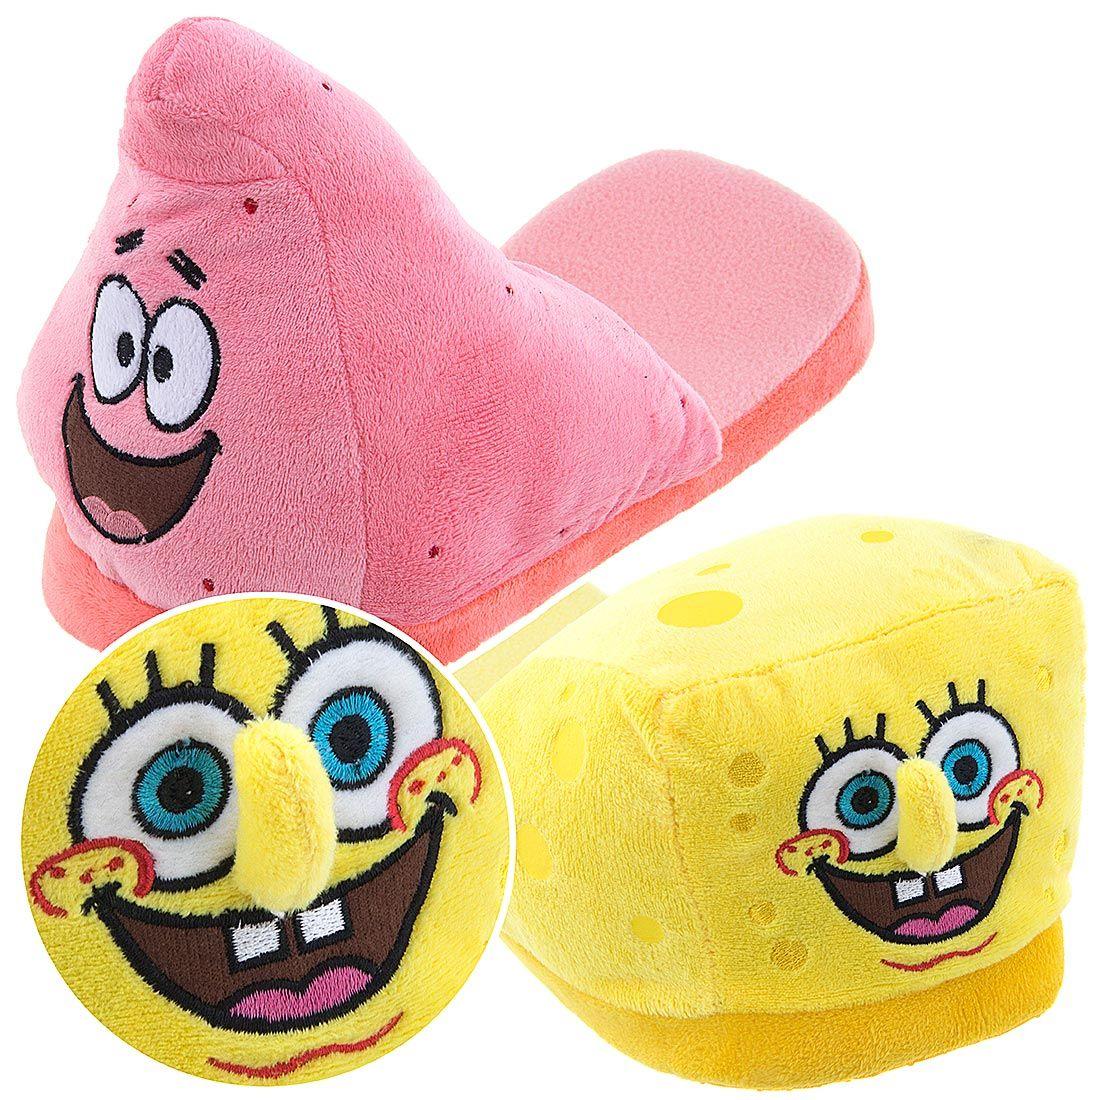 Spongebob And Patrick Slippers For Men Men S Cartoon